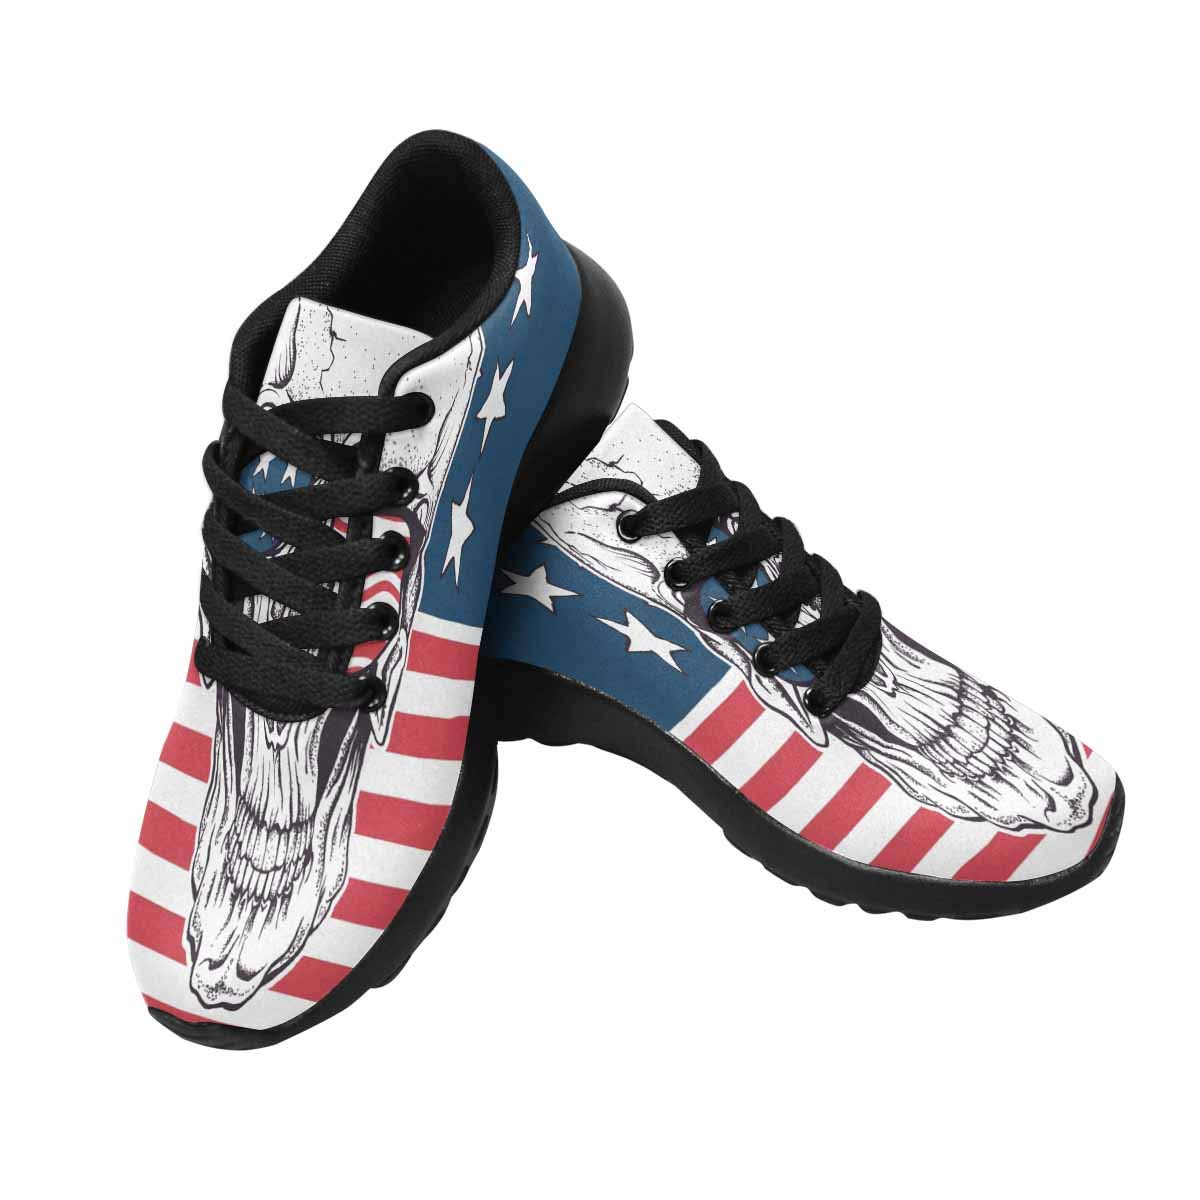 InterestPrint Women's Running Athletic Shoes Sugar Skull in Sunglasses US13